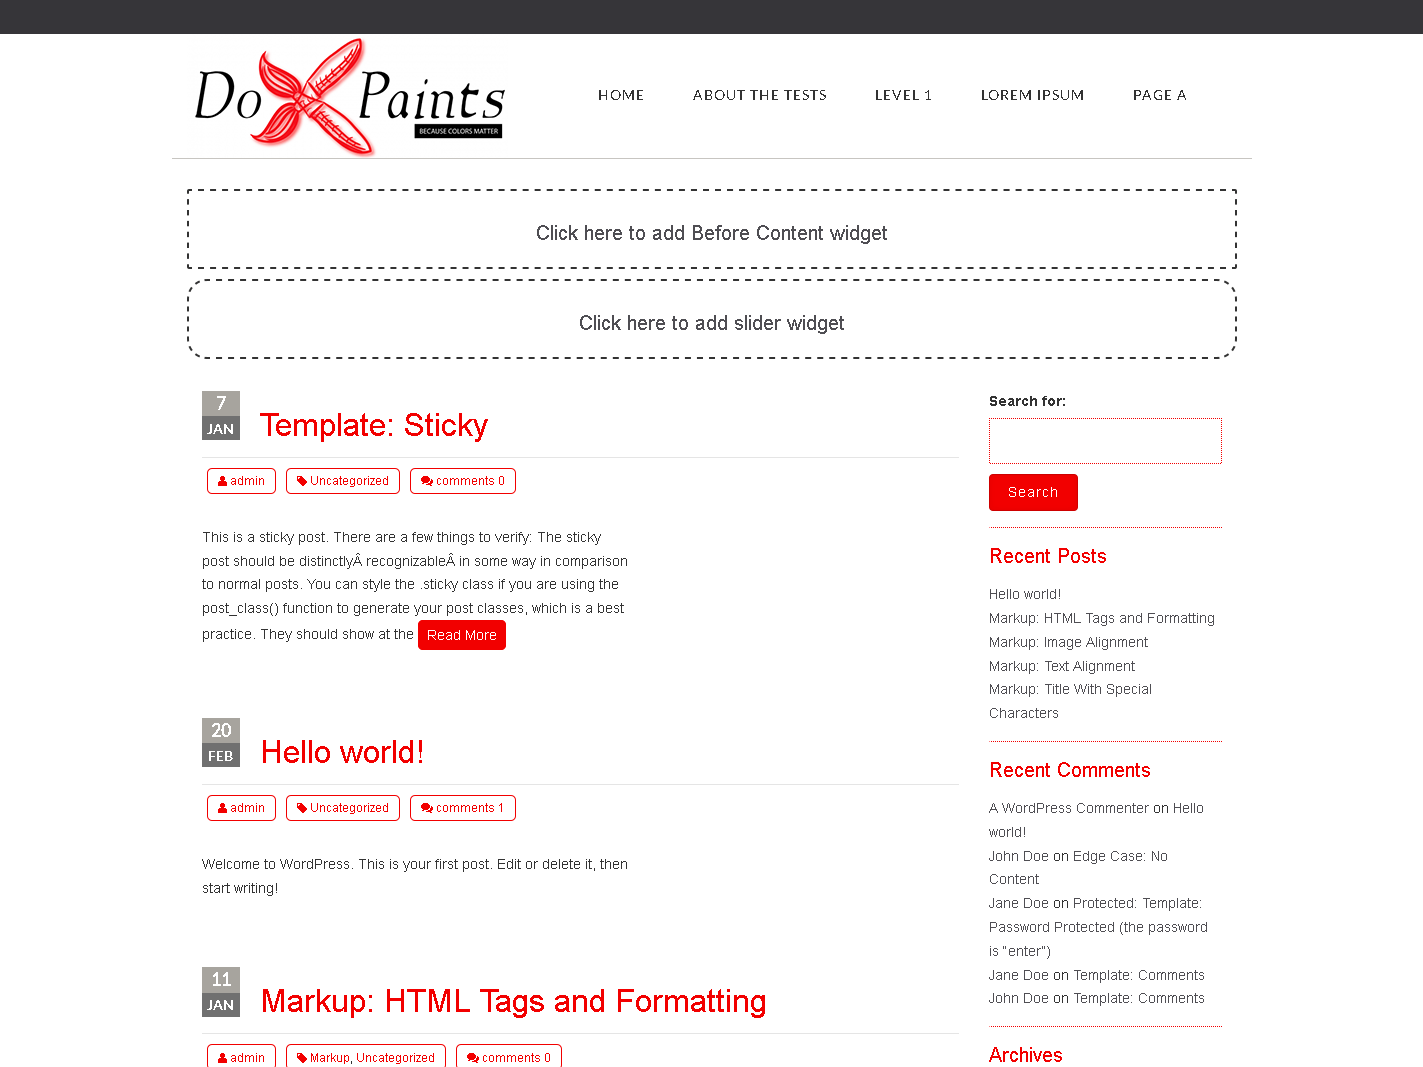 Dox Paint